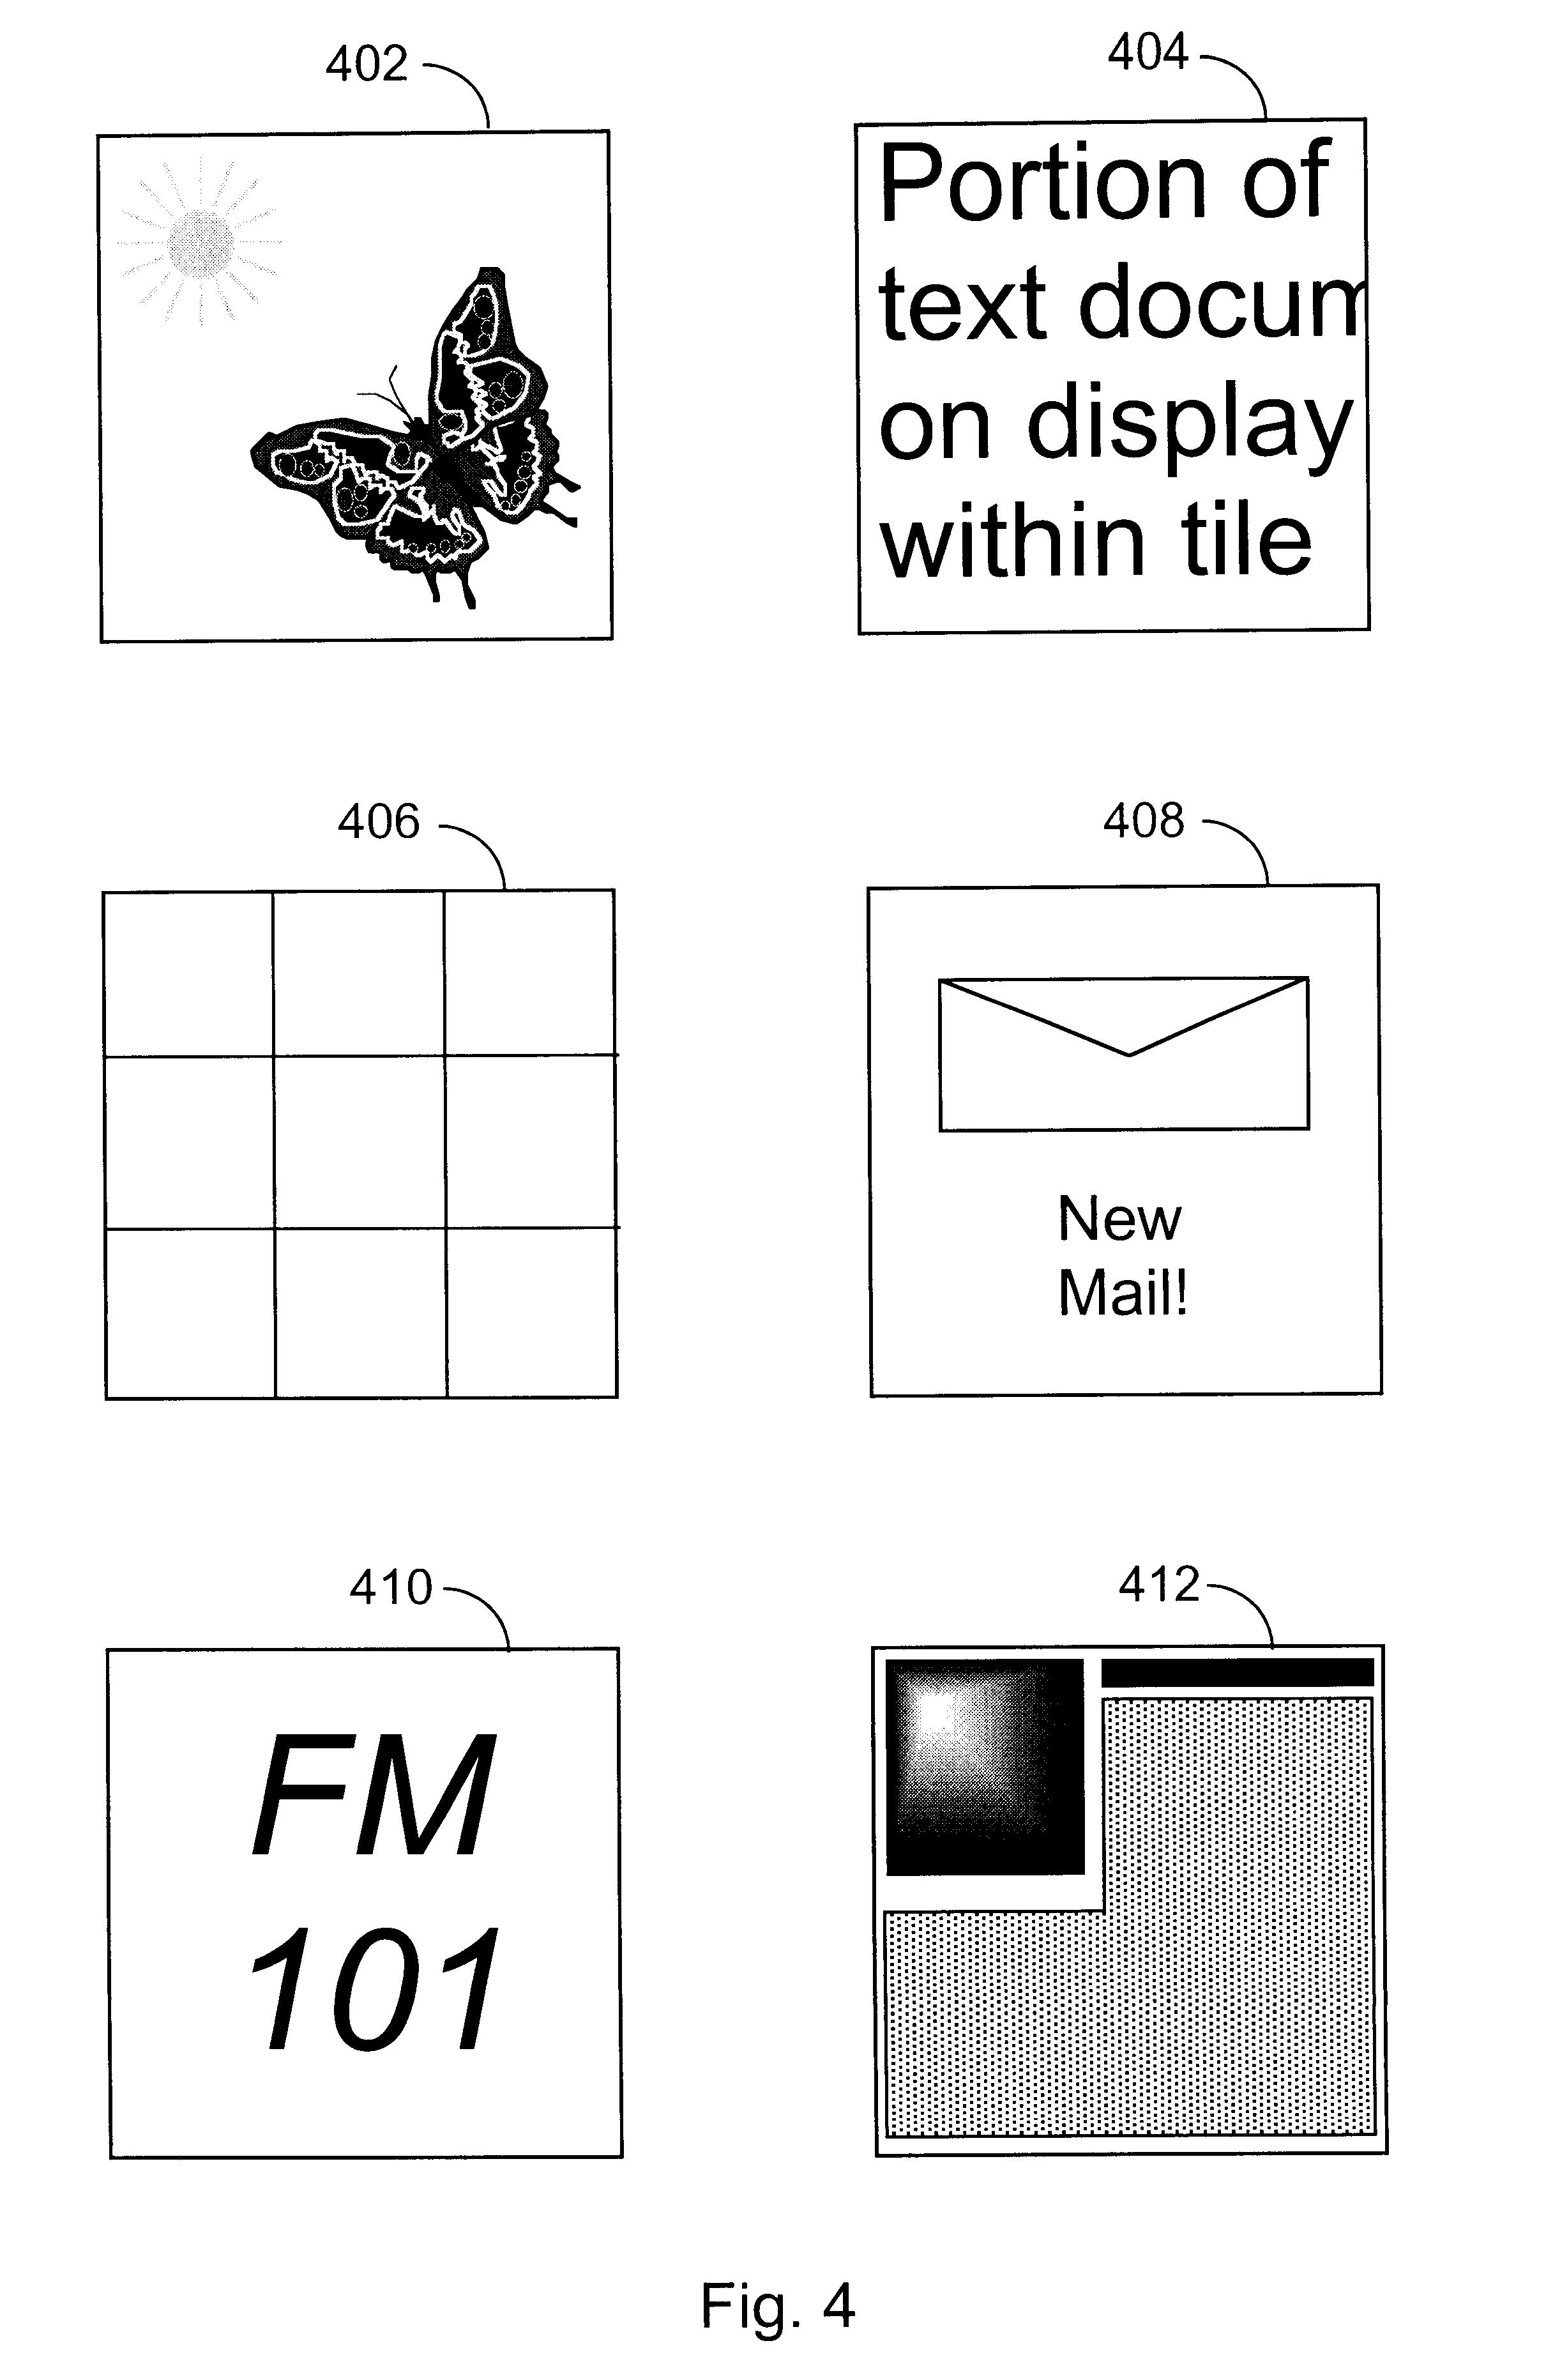 Patent US 6,724,403 B1